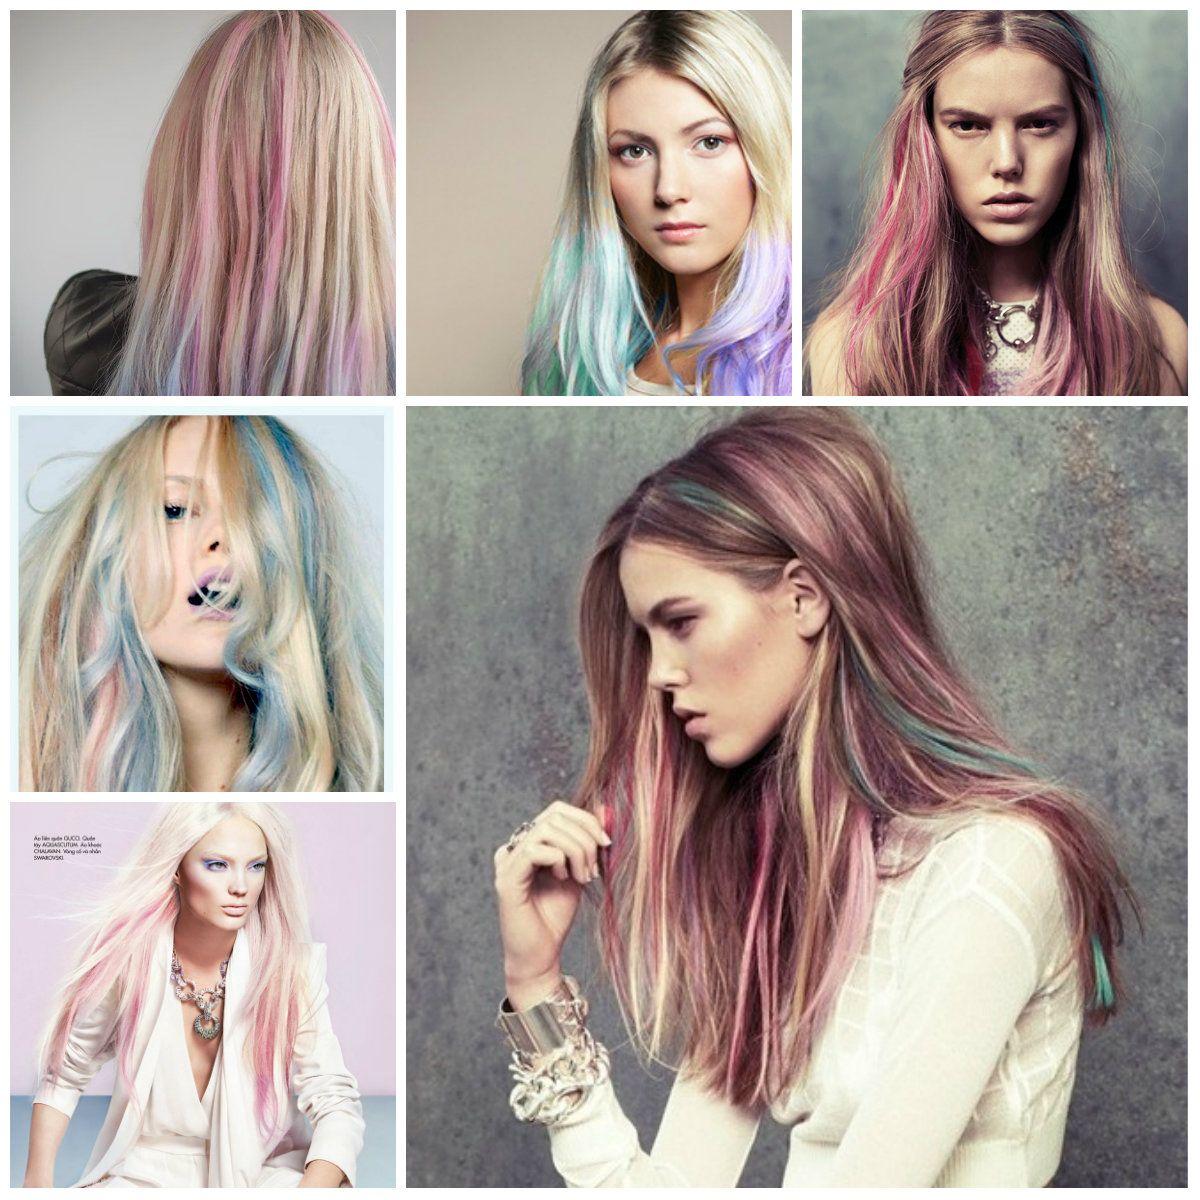 Pastel Hair Colors 2016 Organic Hair Colors 2015 2016 Trends